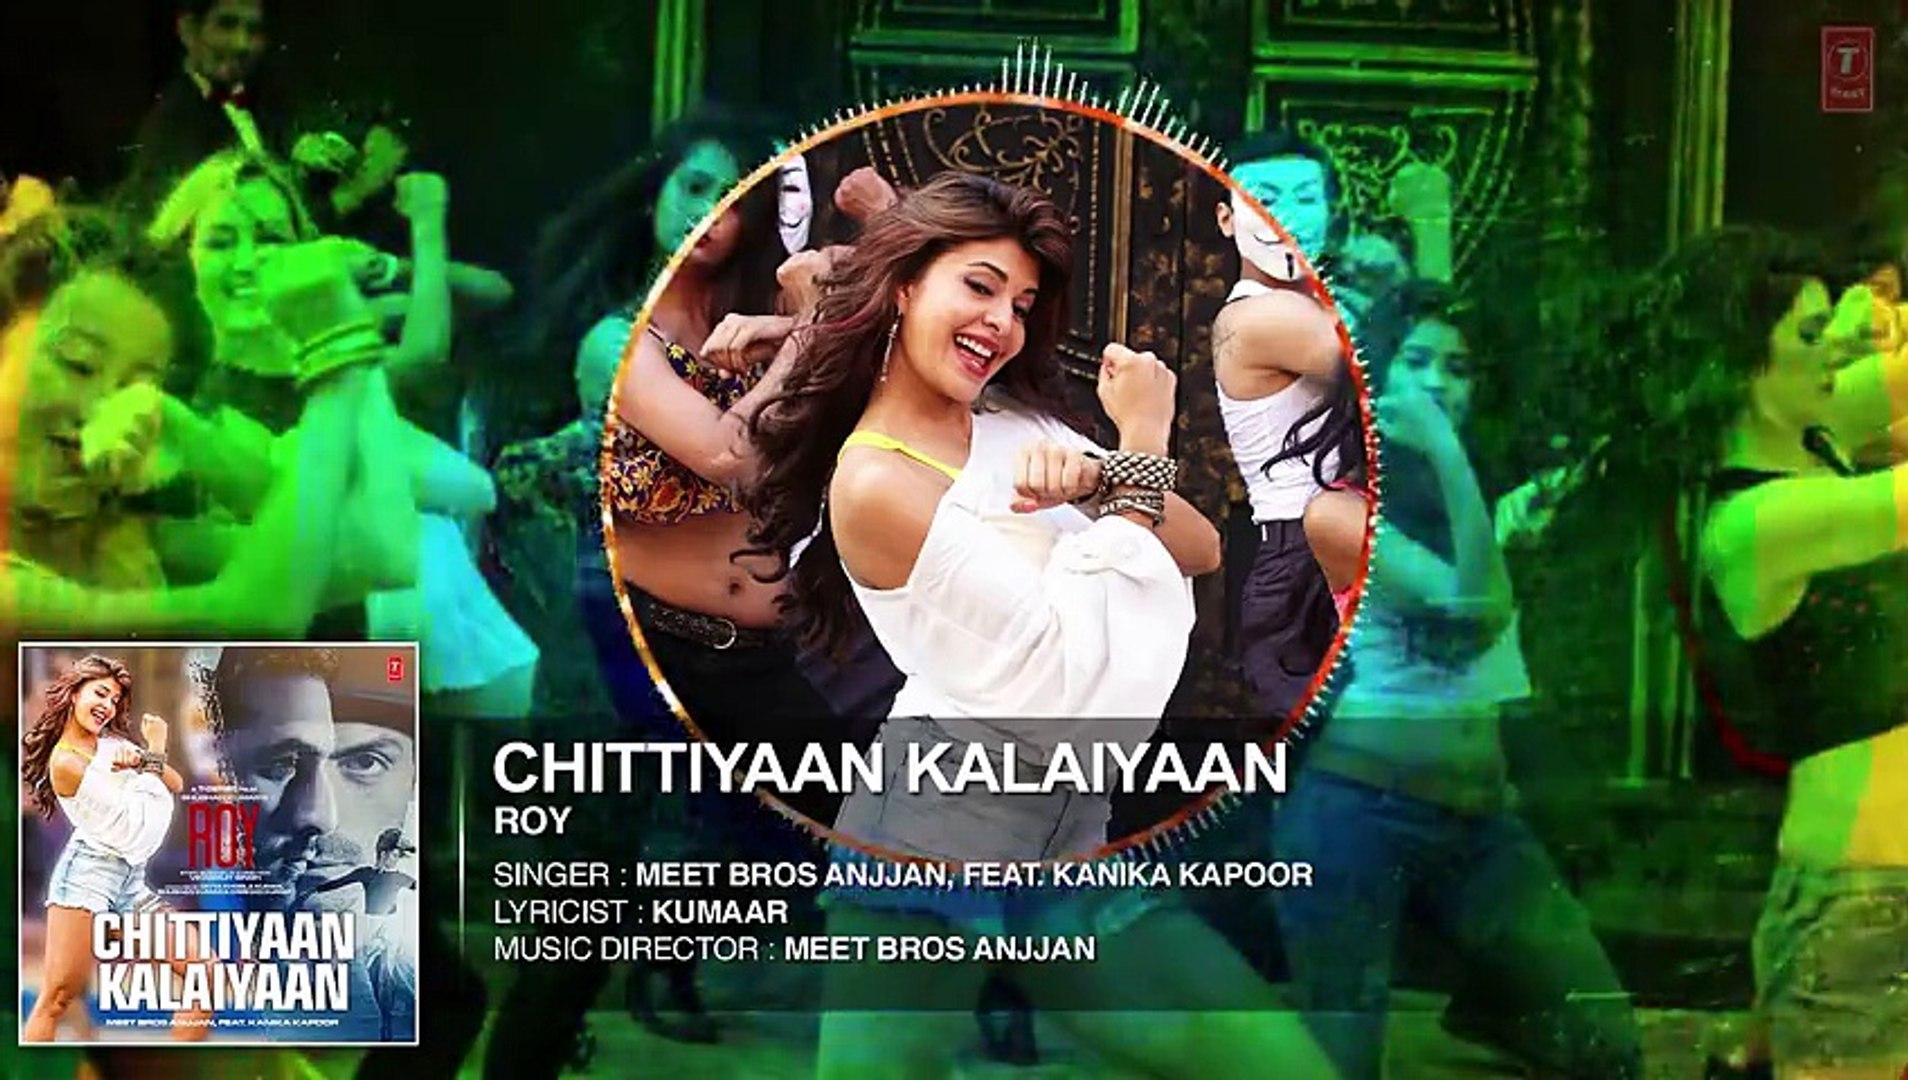 Official Chittiyaan Kalaiyaan FULL HD AUDIO SONG | Roy | Meet Bros Anjjan | Jacqueline Fernandez | 7